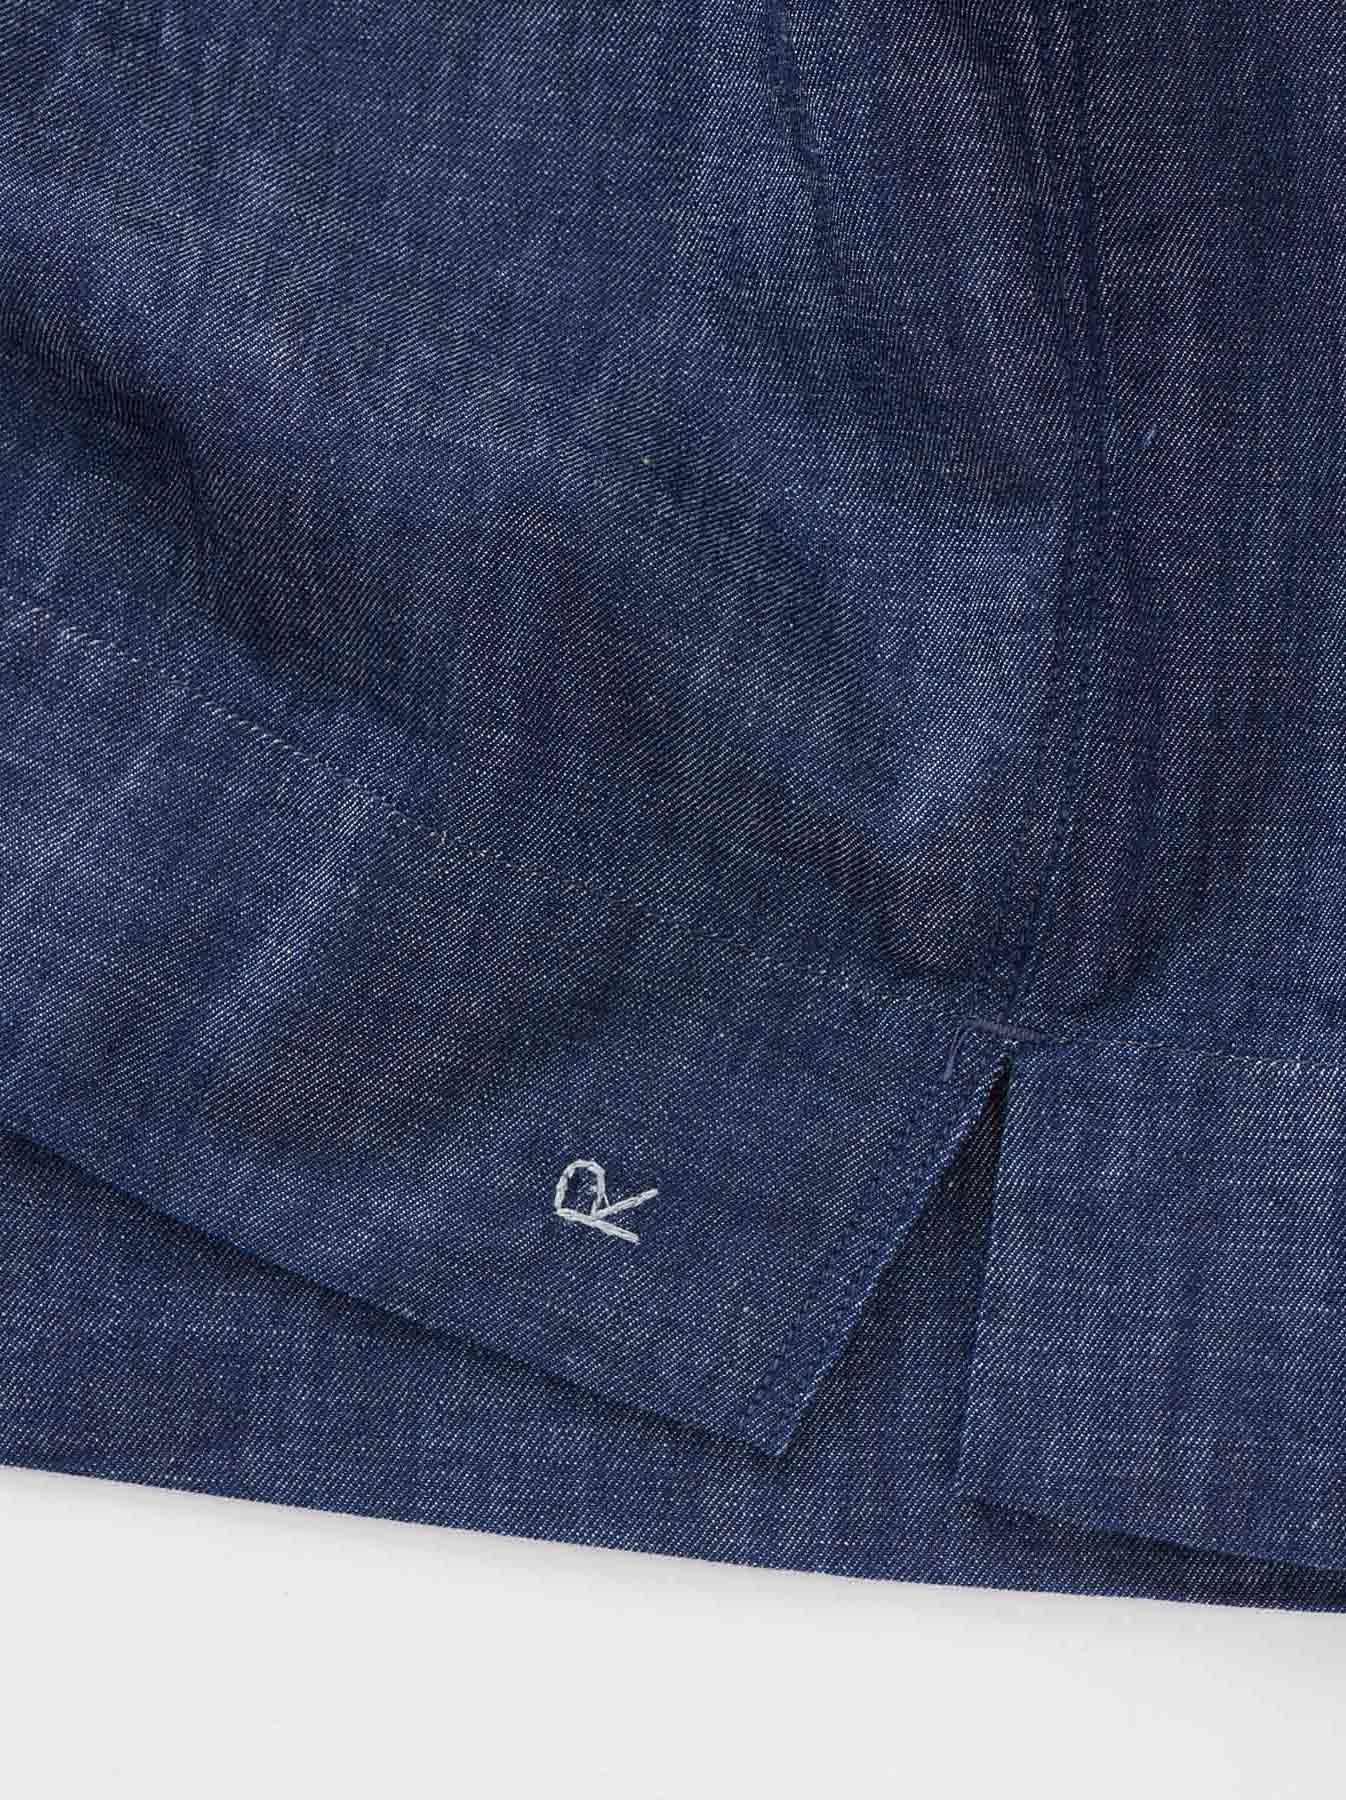 WH Goma Denim Umahiko Pullover Shirt-9